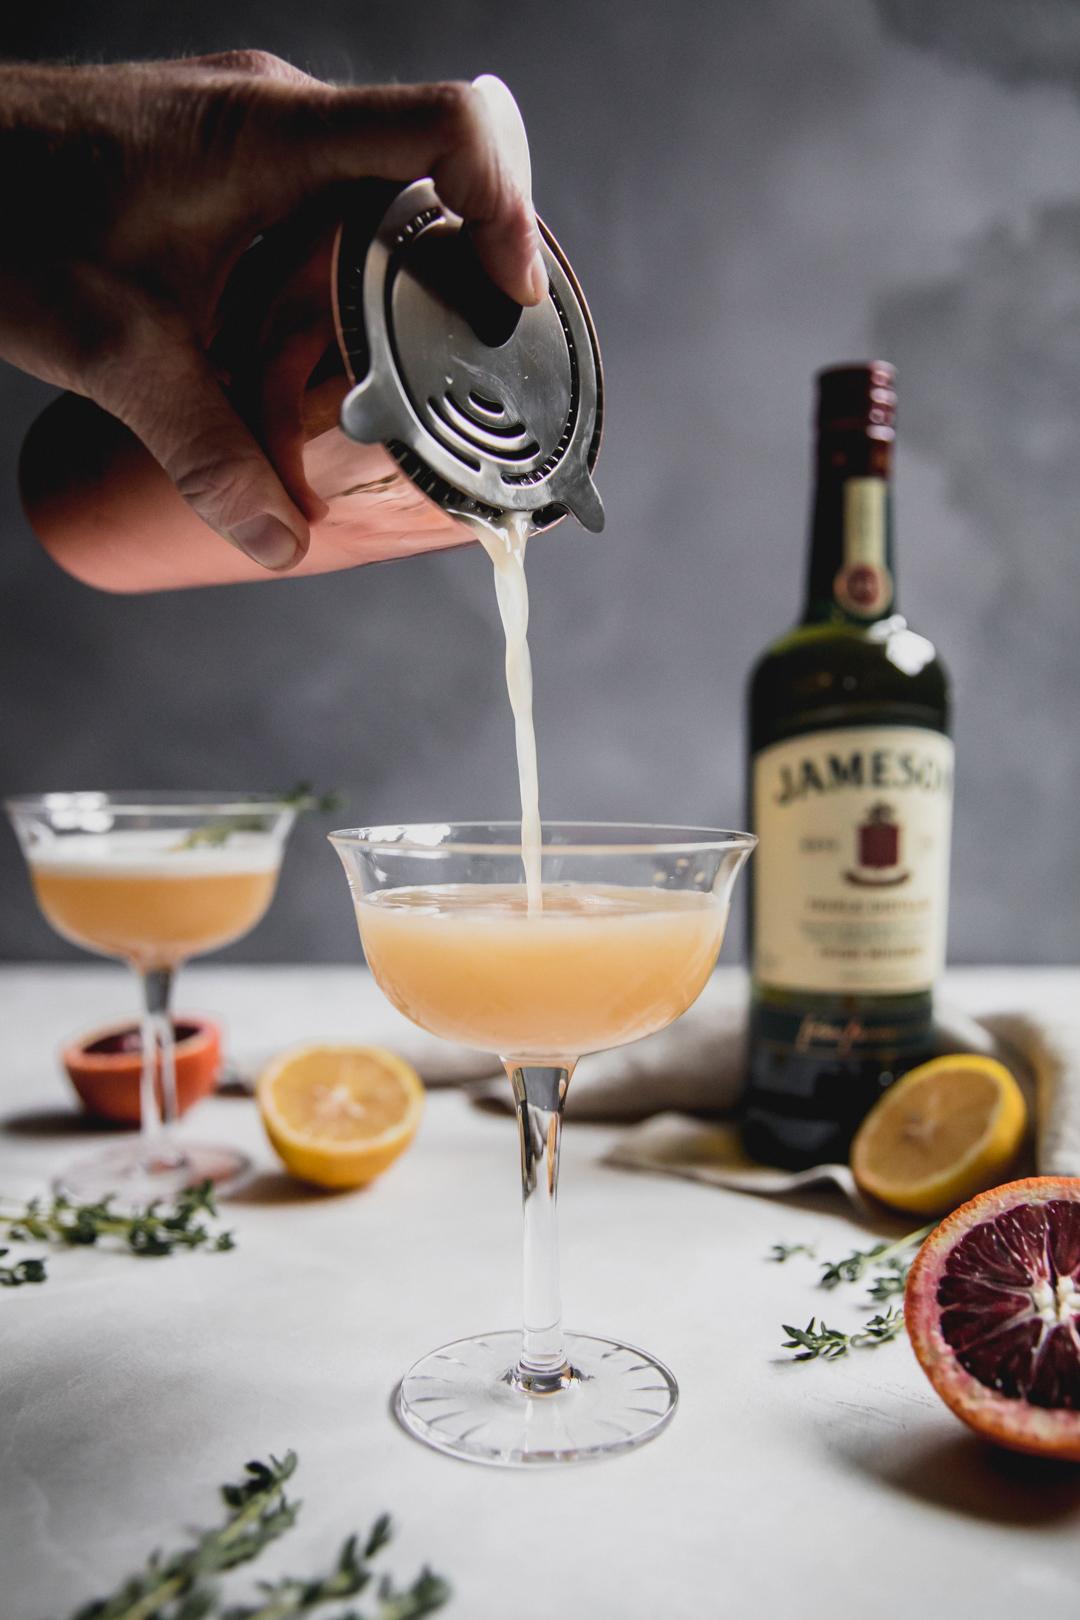 Jameson Irish Whisky - Recipe Development + Brand Collaboration